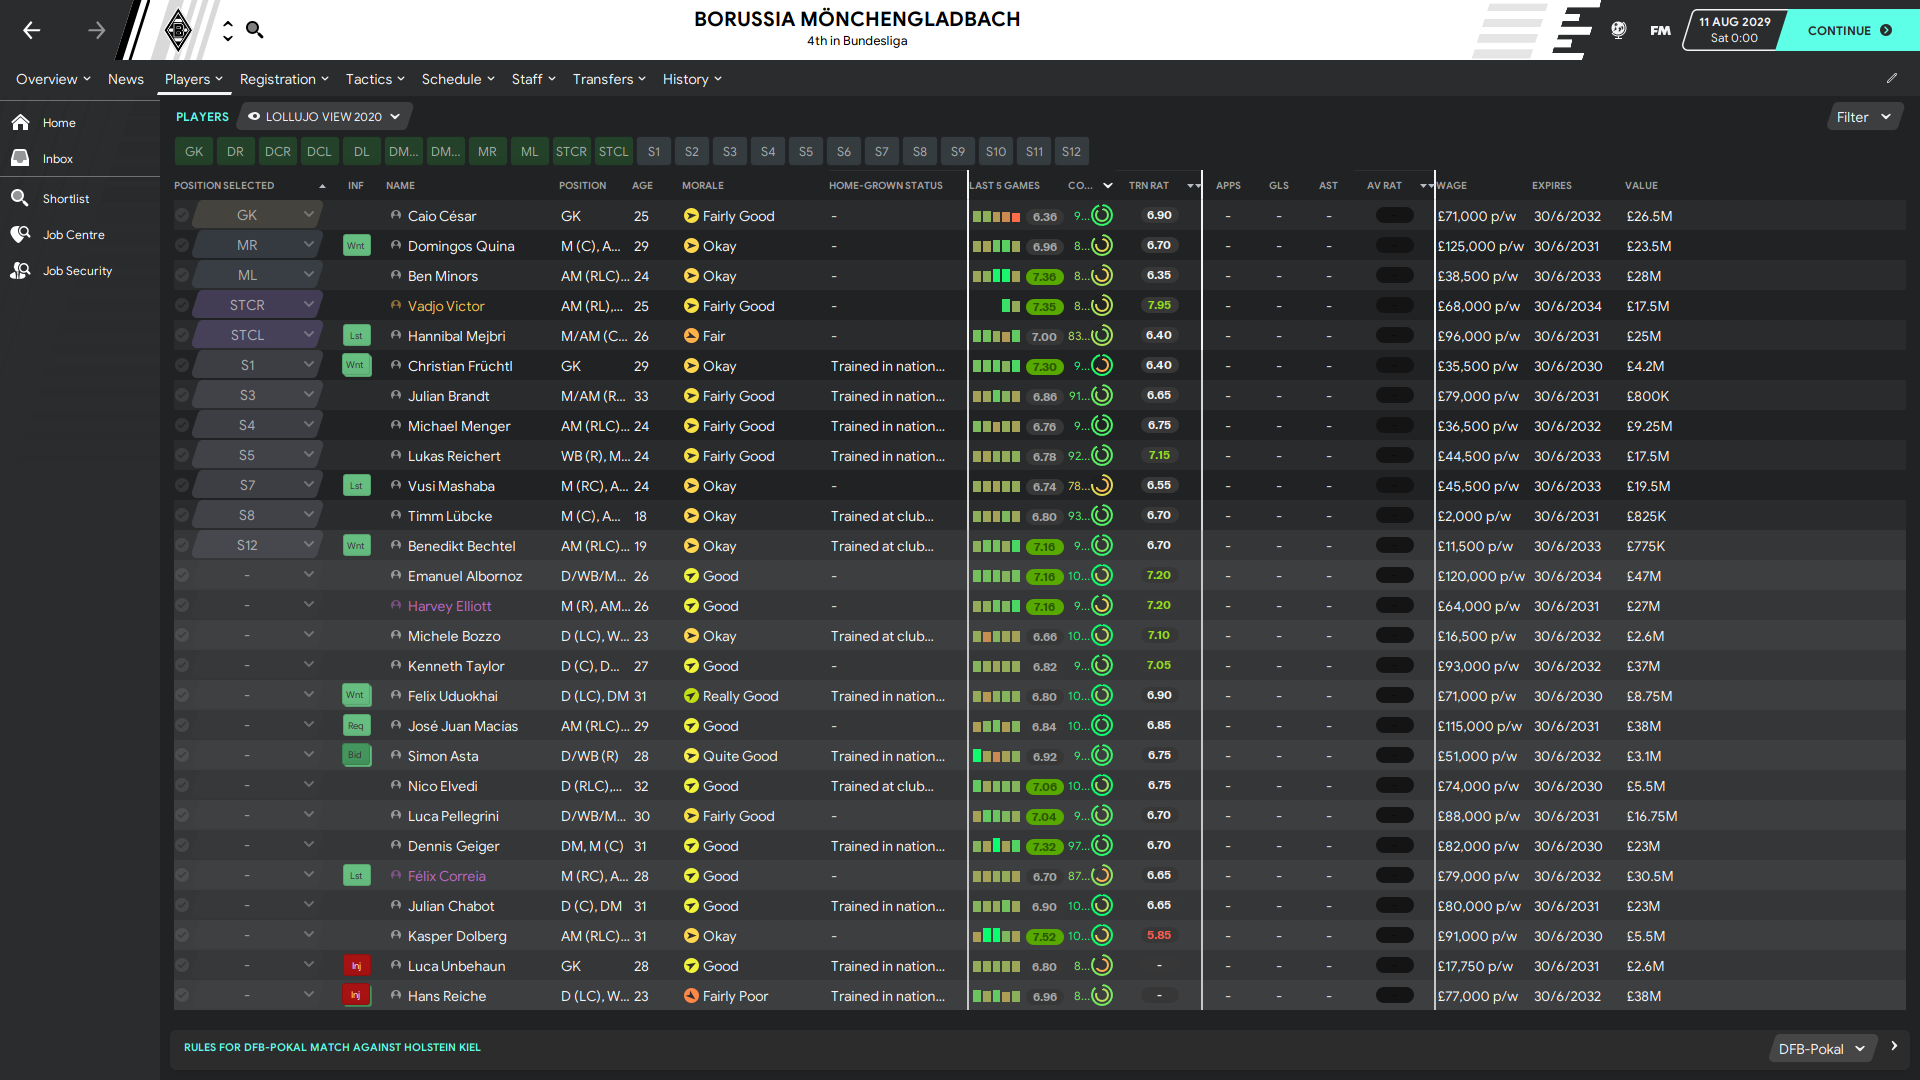 Borussia Mönchengladbach_ Senior Squad.png